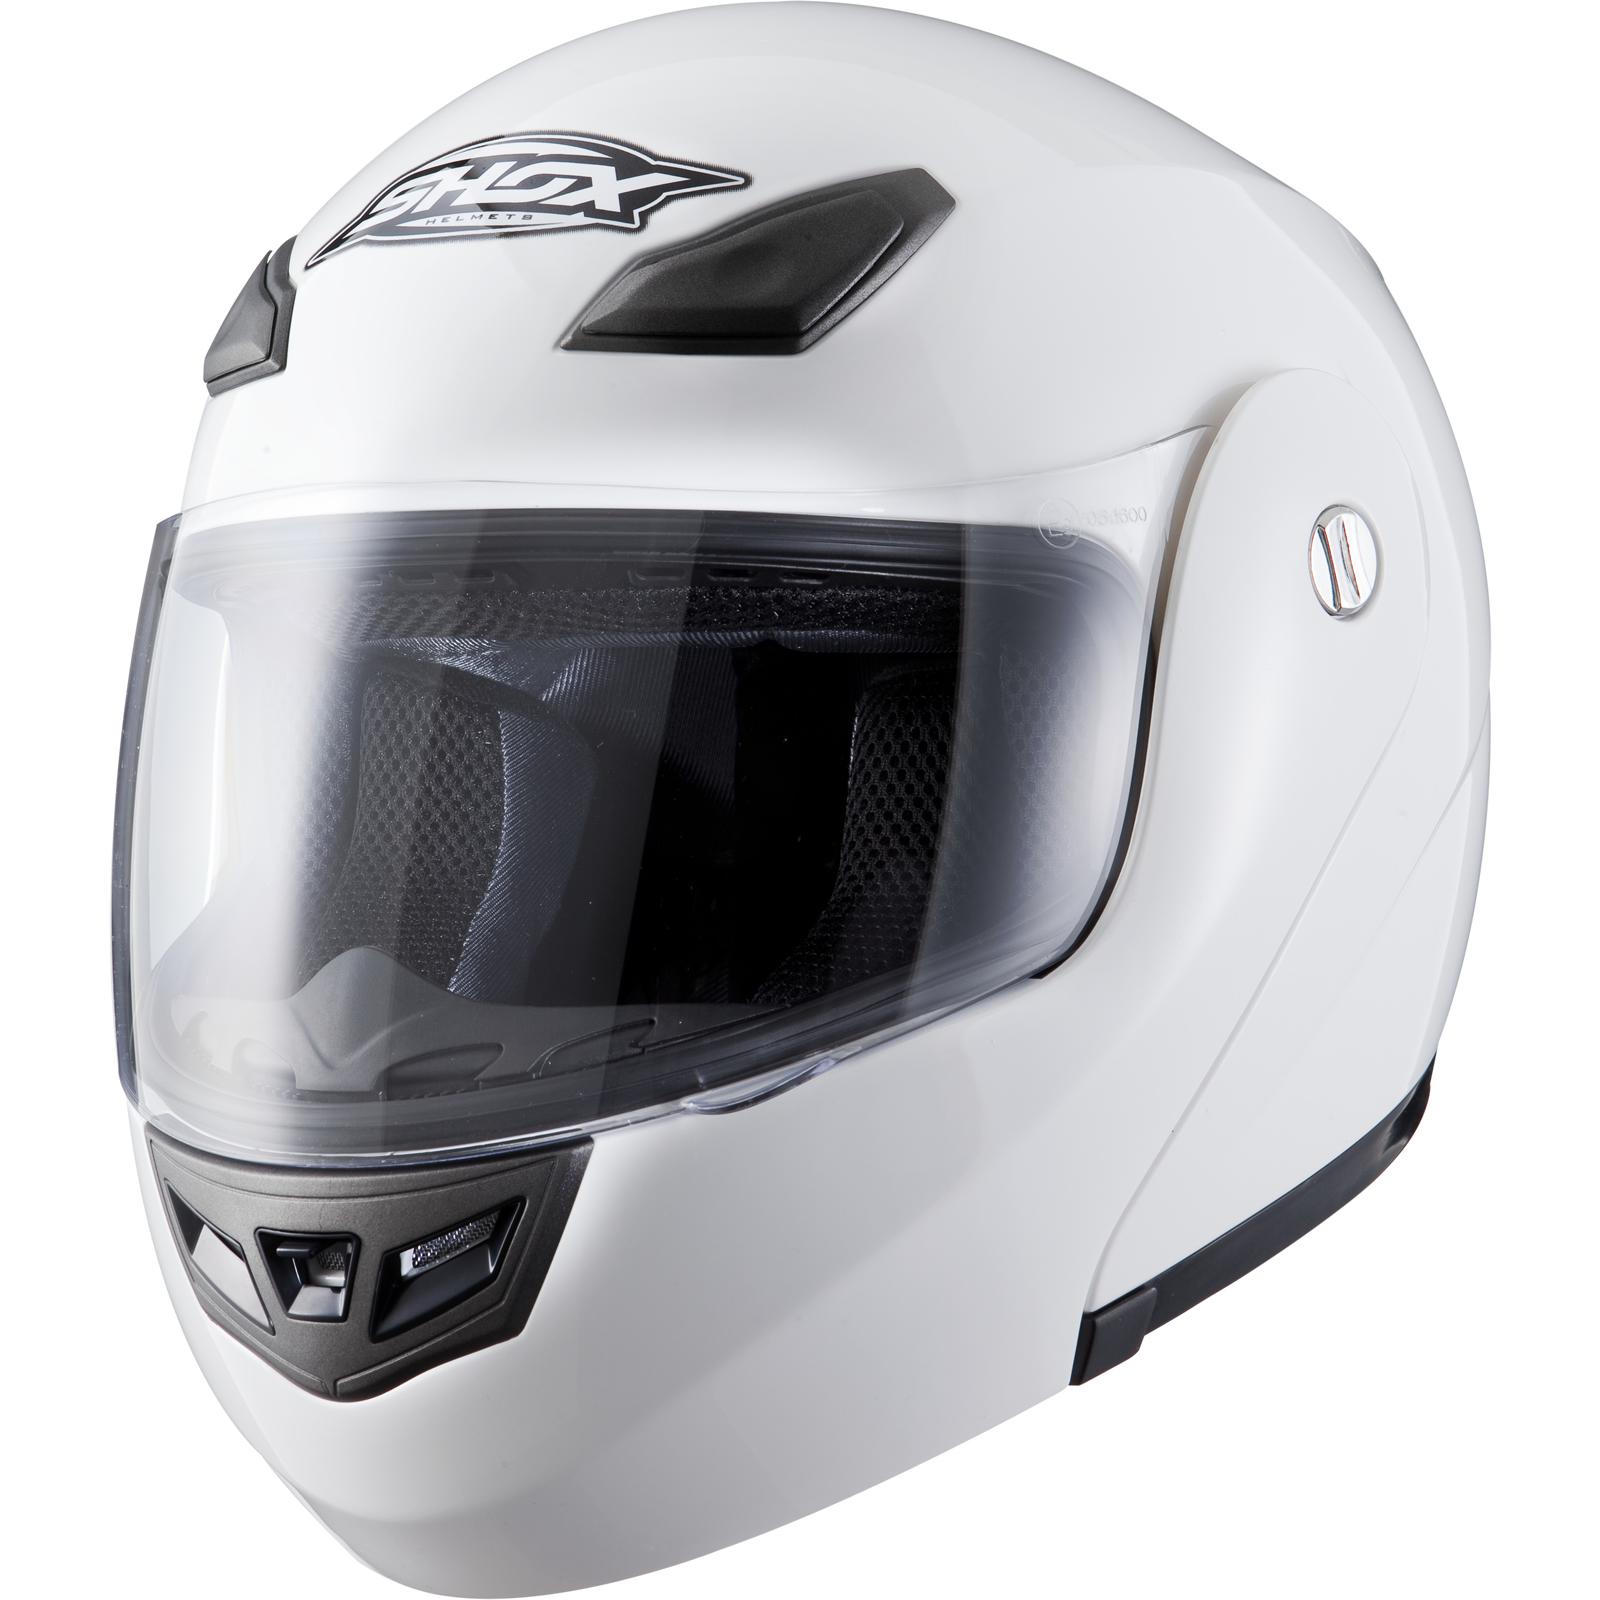 Shox Bullet Flip Up Front Modular Motorcycle Motorbike Bike Scooter Crash Helmet